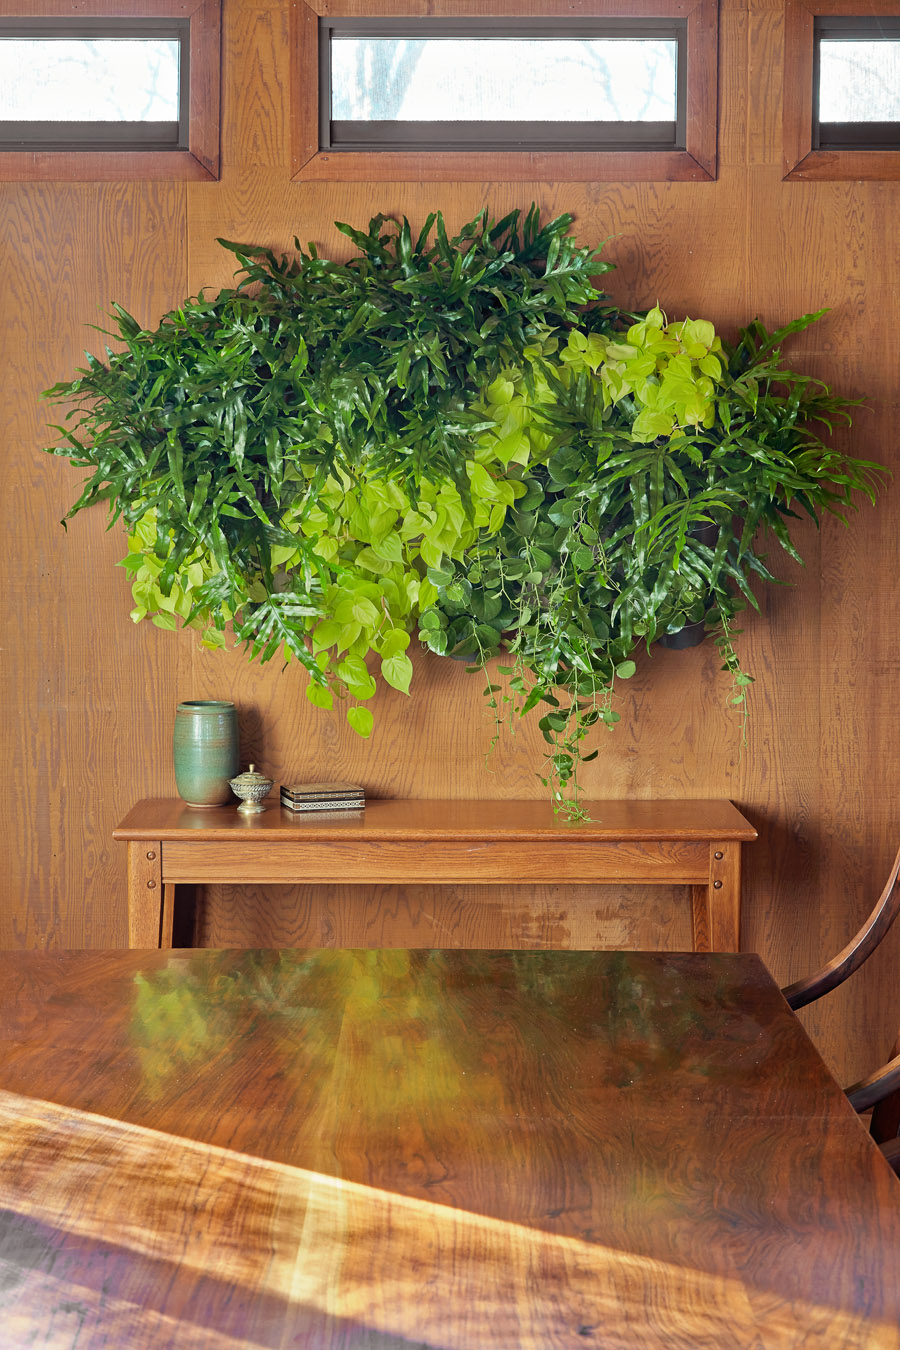 11-faca-voce-mesmo-jardim-vertical-para-decorar-a-casa